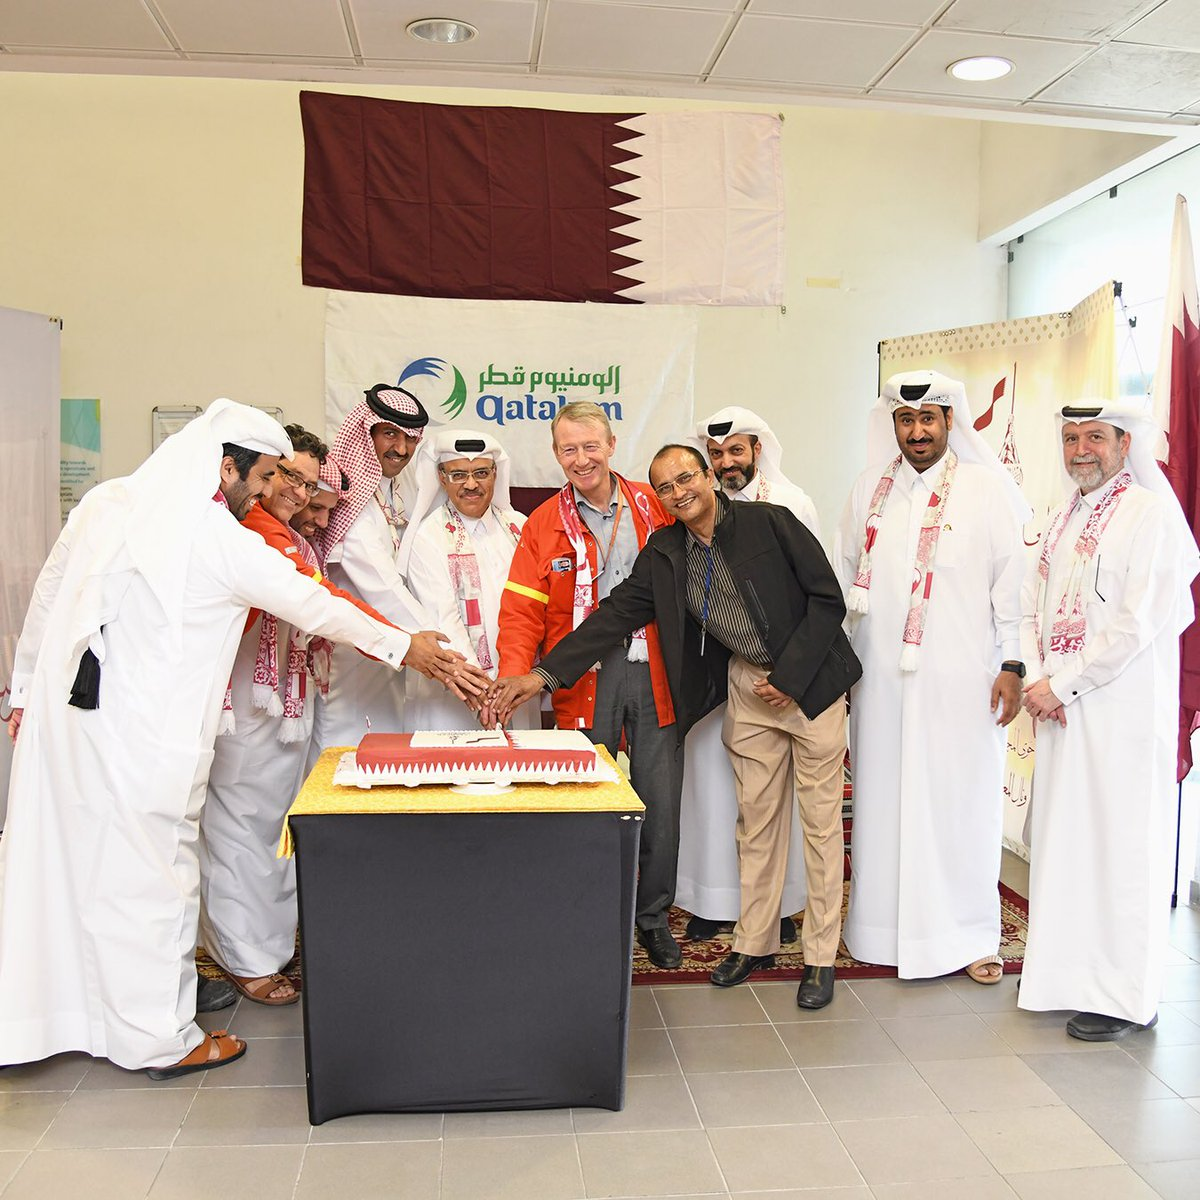 Qatalum celebrates Qatar National Day. #QND #QNV2030 #QATAR #QATALUM